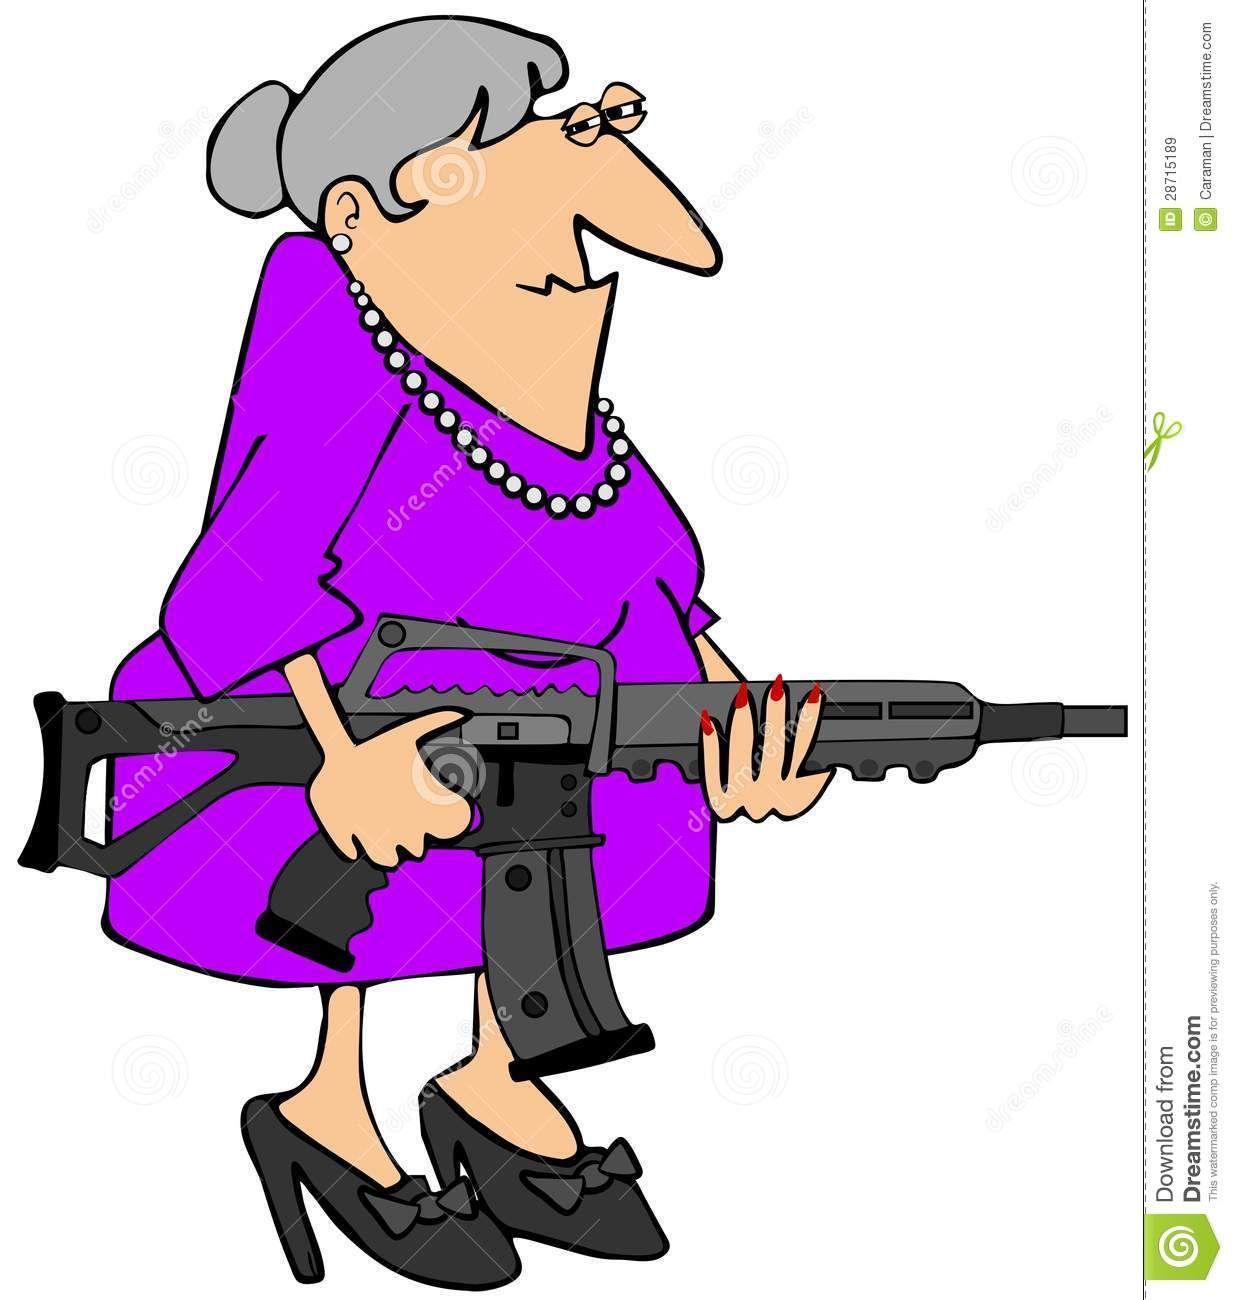 Bad grandma clipart vector free library Cartoon Grandma Clipart - Free Clip Art Images | My Style | Cartoon ... vector free library